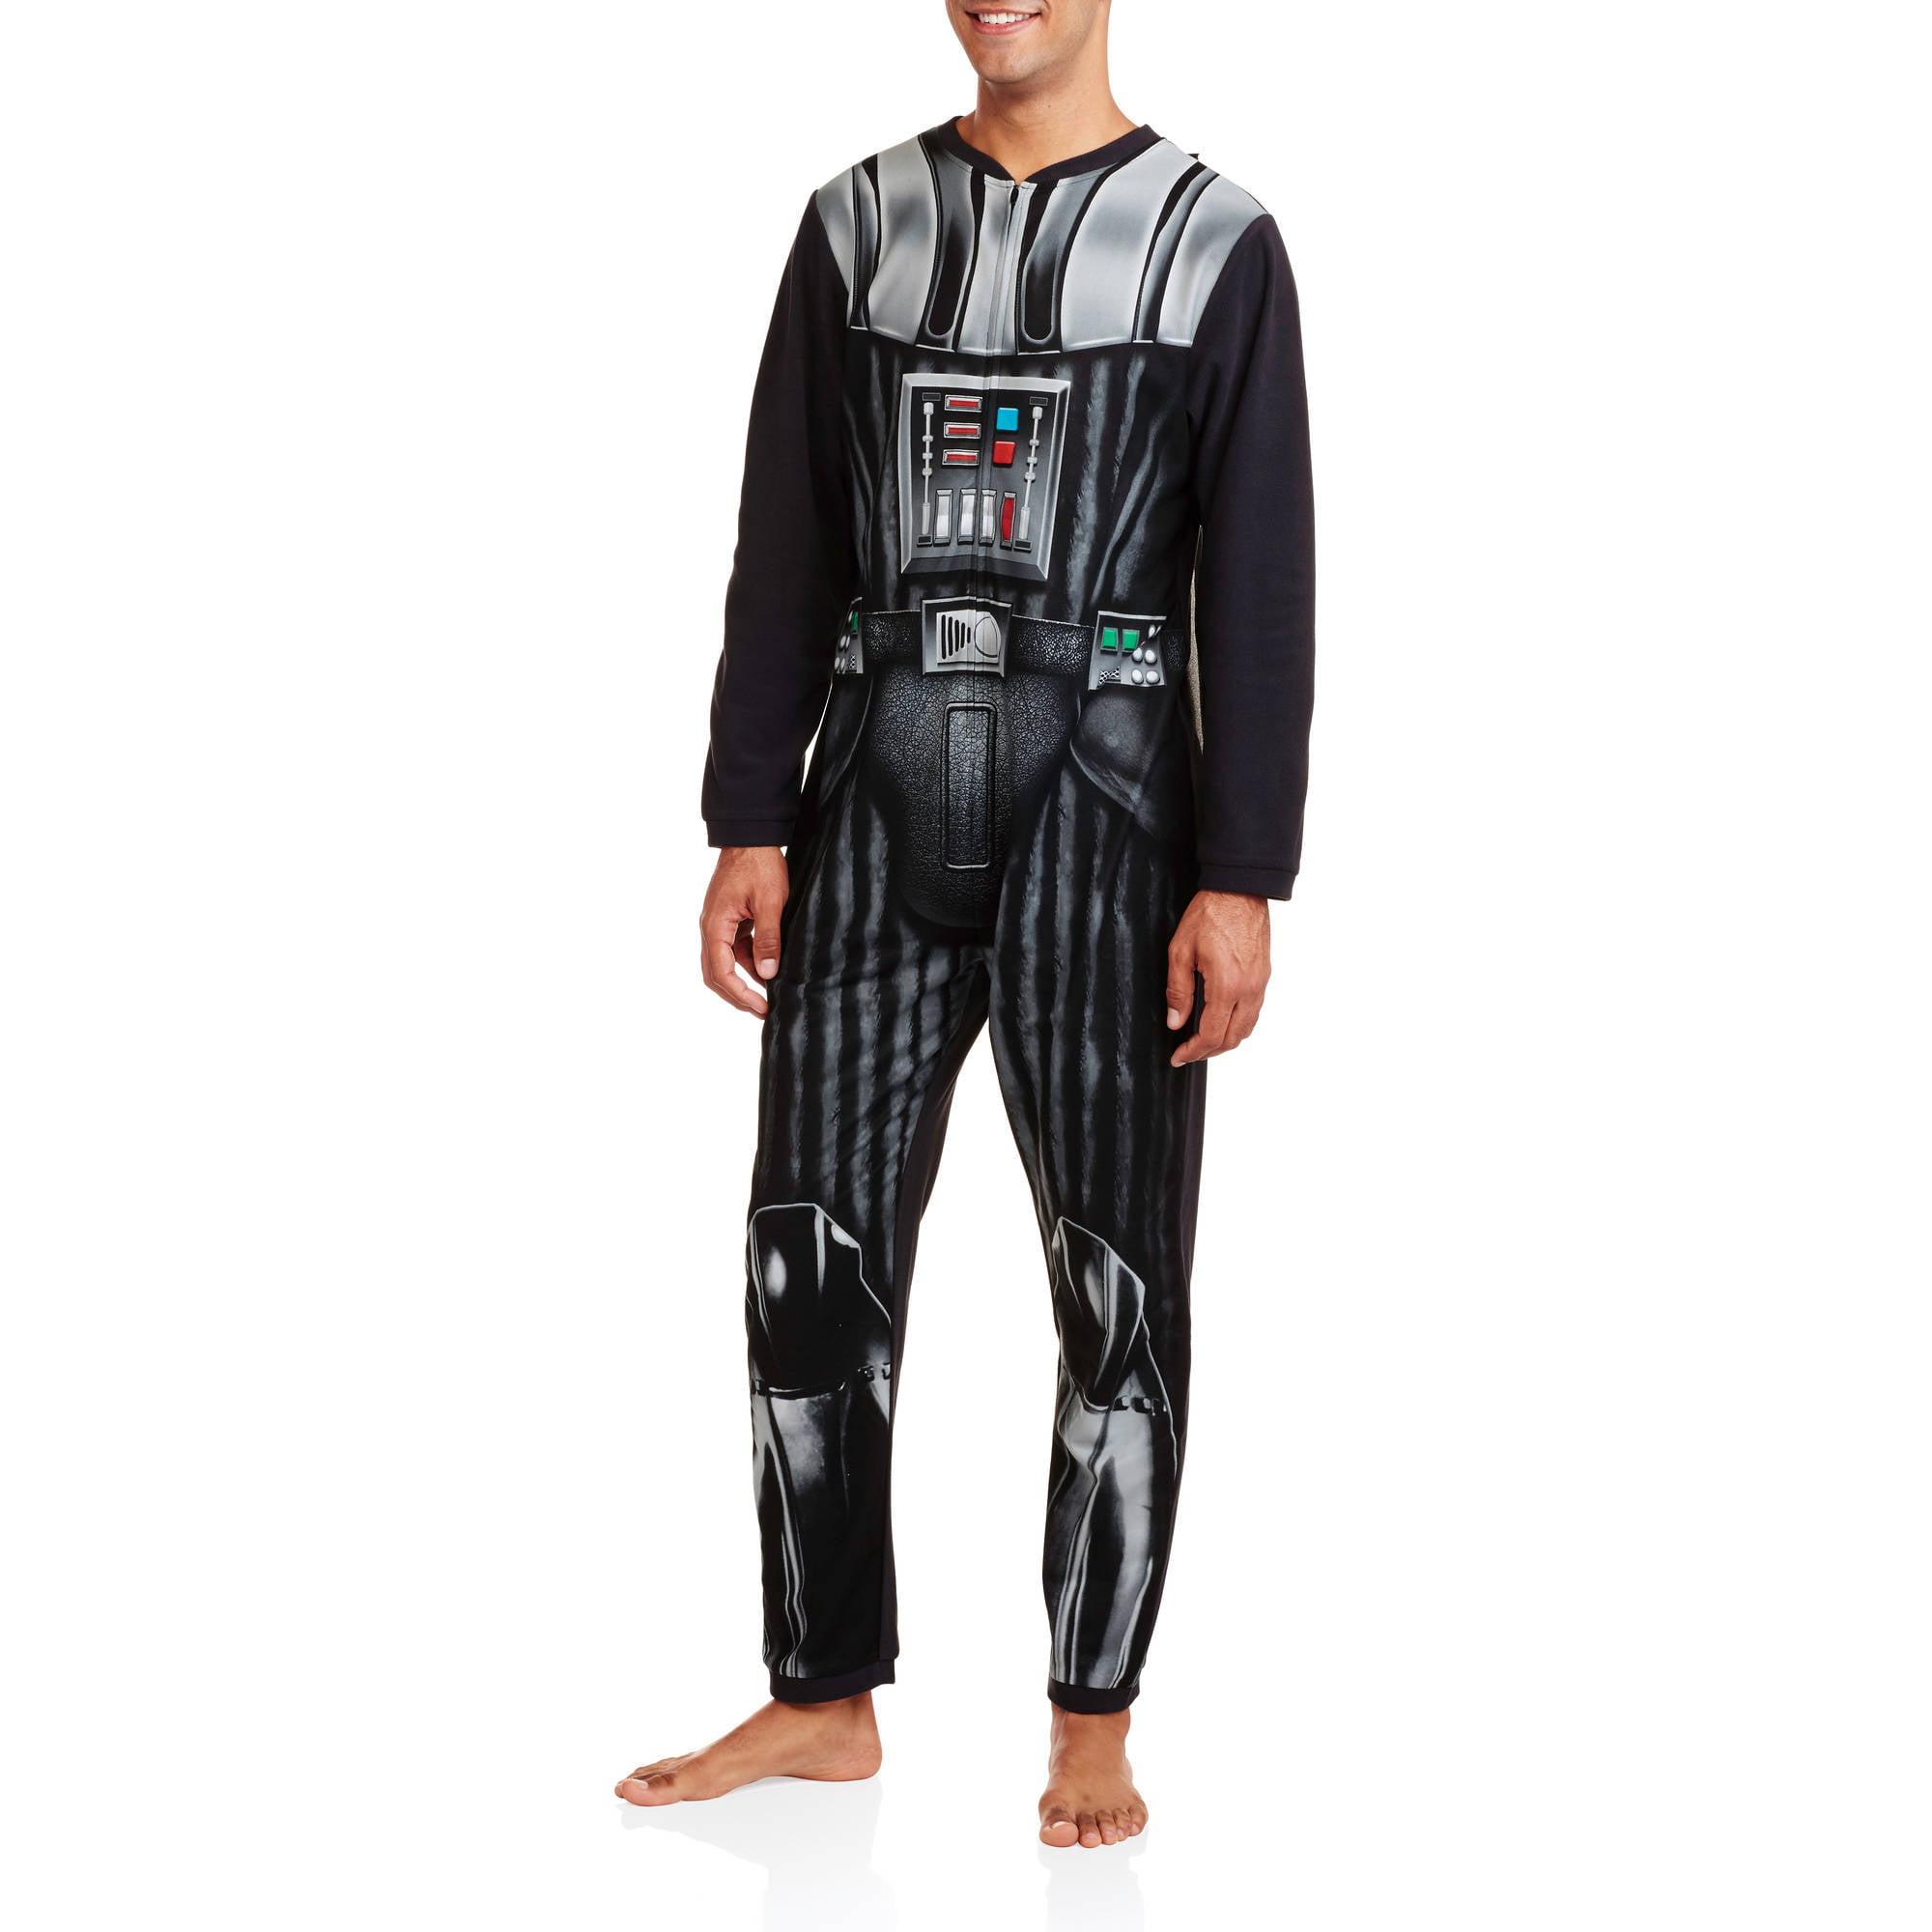 Star Wars Vader Cape Men's Onesie Licensed Union Suit